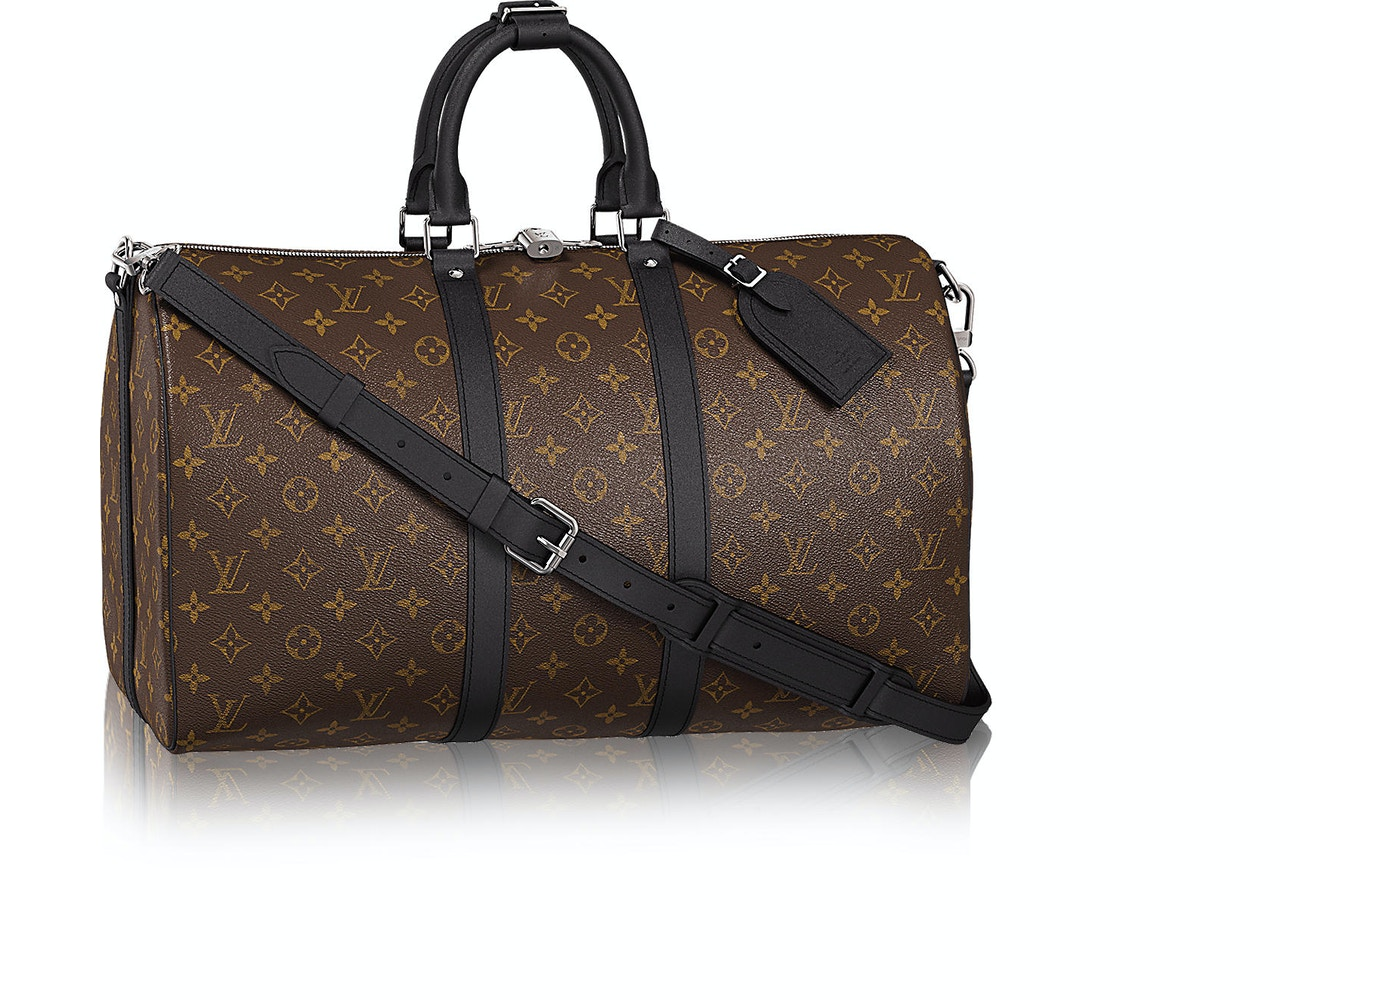 67876a02203b Louis Vuitton Keepall Bandouliere Monogram Macassar (With ...